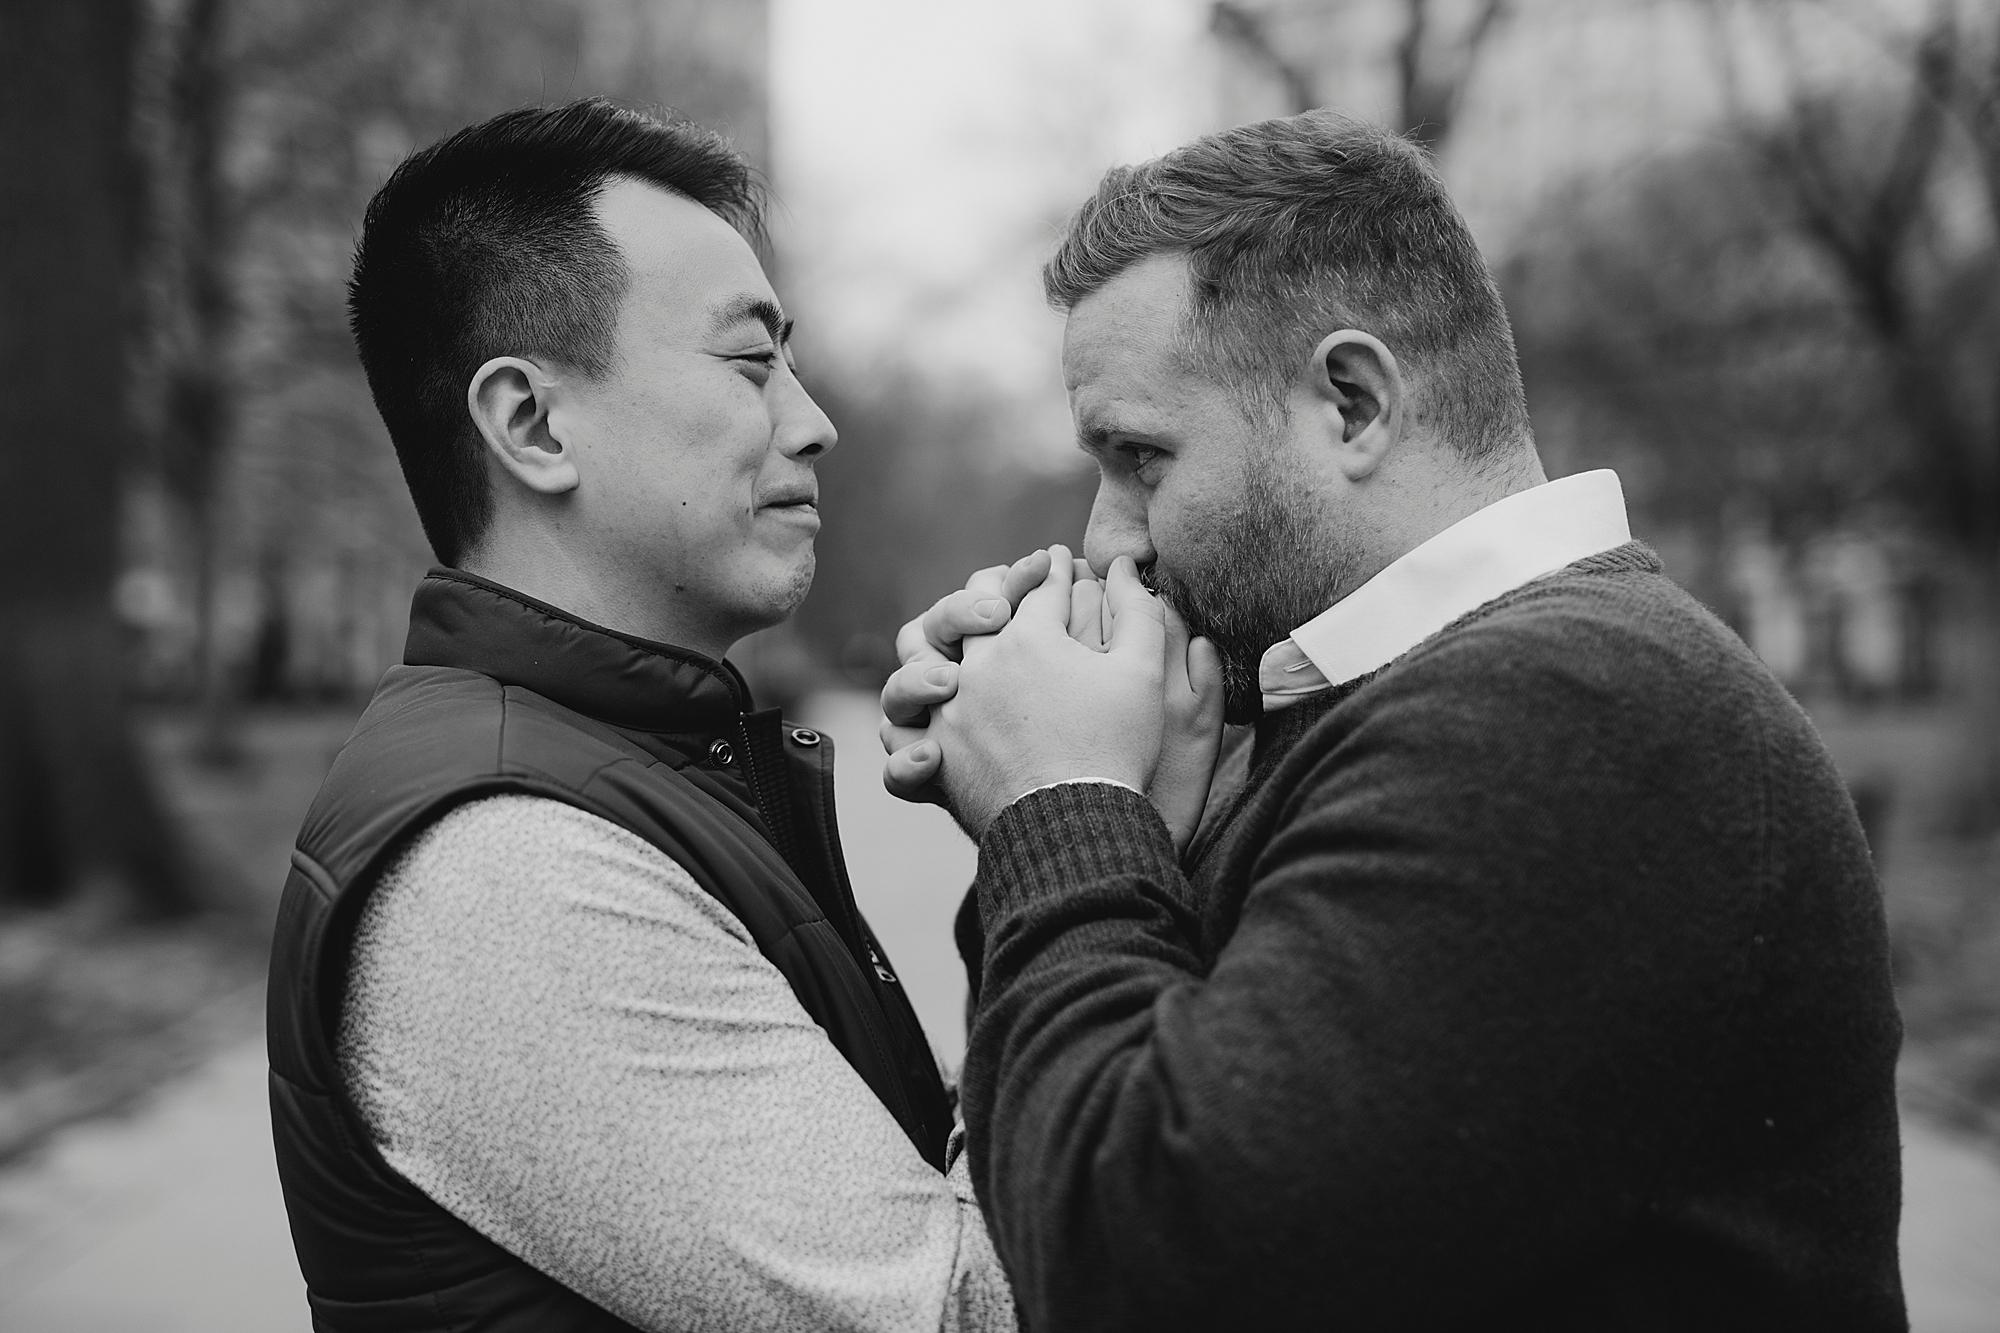 Love_BY_Joe_Mac_Creative_Philadelphia_Philly_Wedding_Photography_Gay_LGBT_Queer_Washington_Square_Park_Philadelphia__0013.jpg